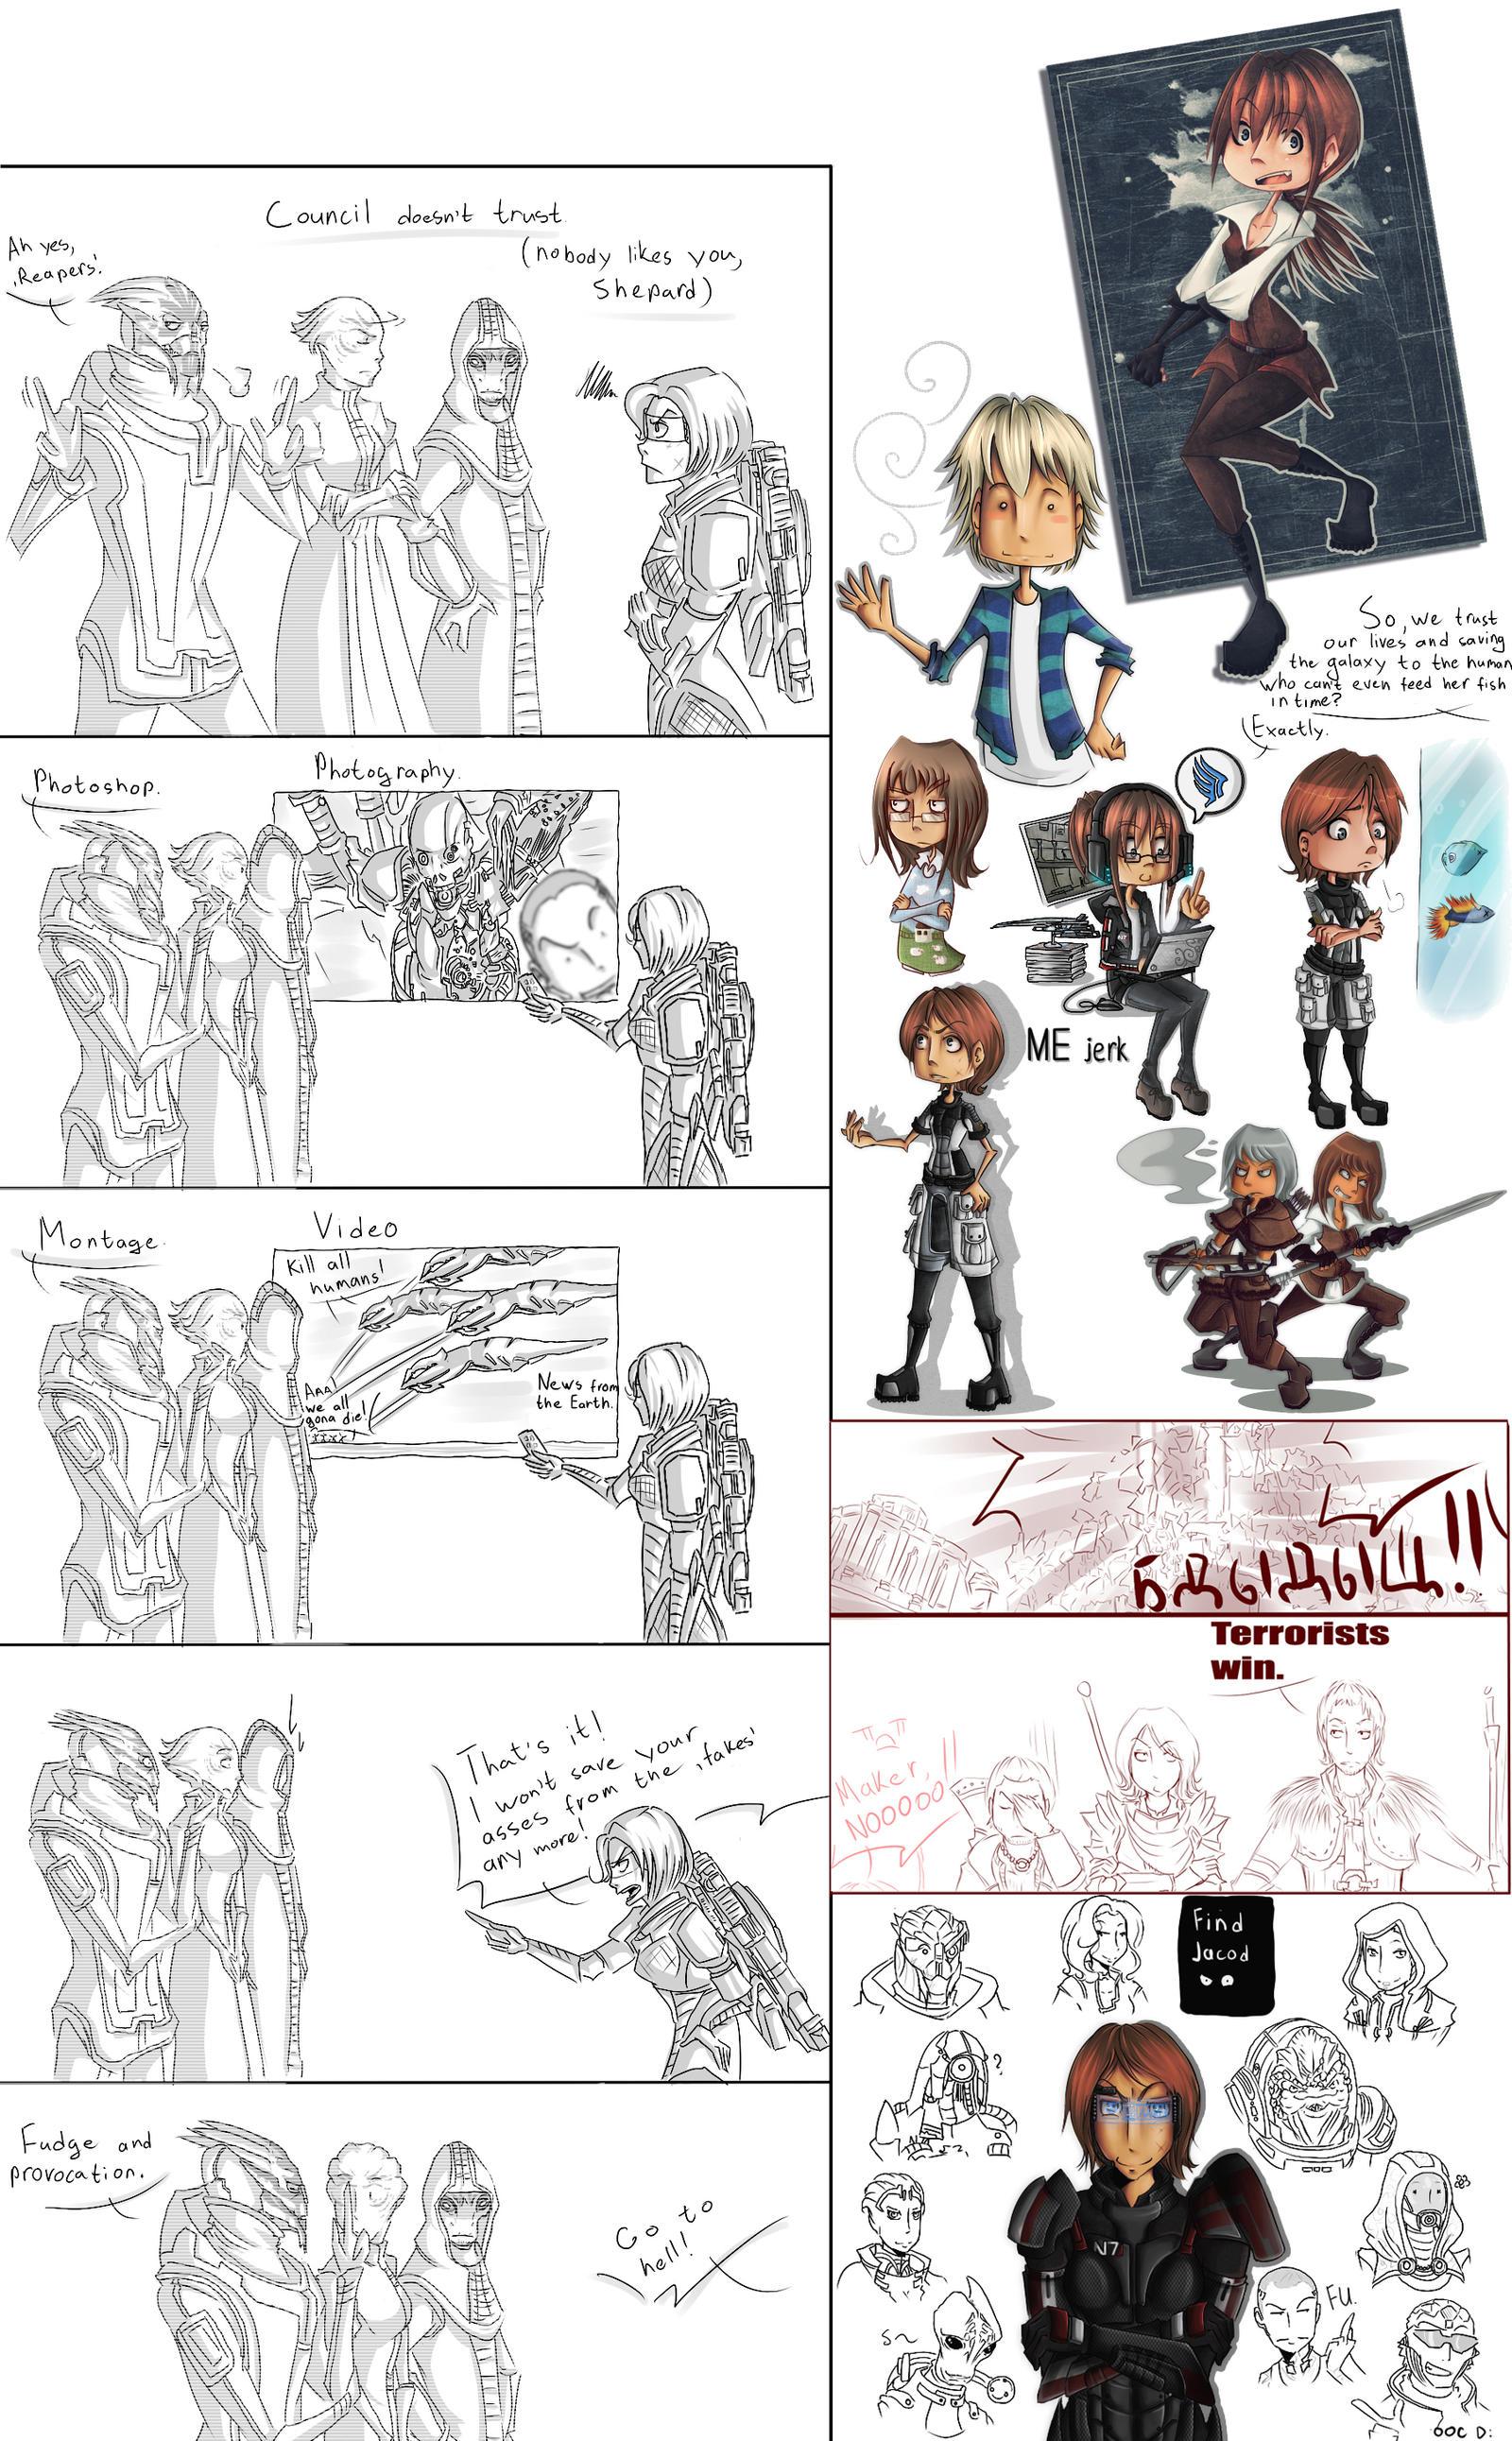 Another sketch dump by Kiany-kun